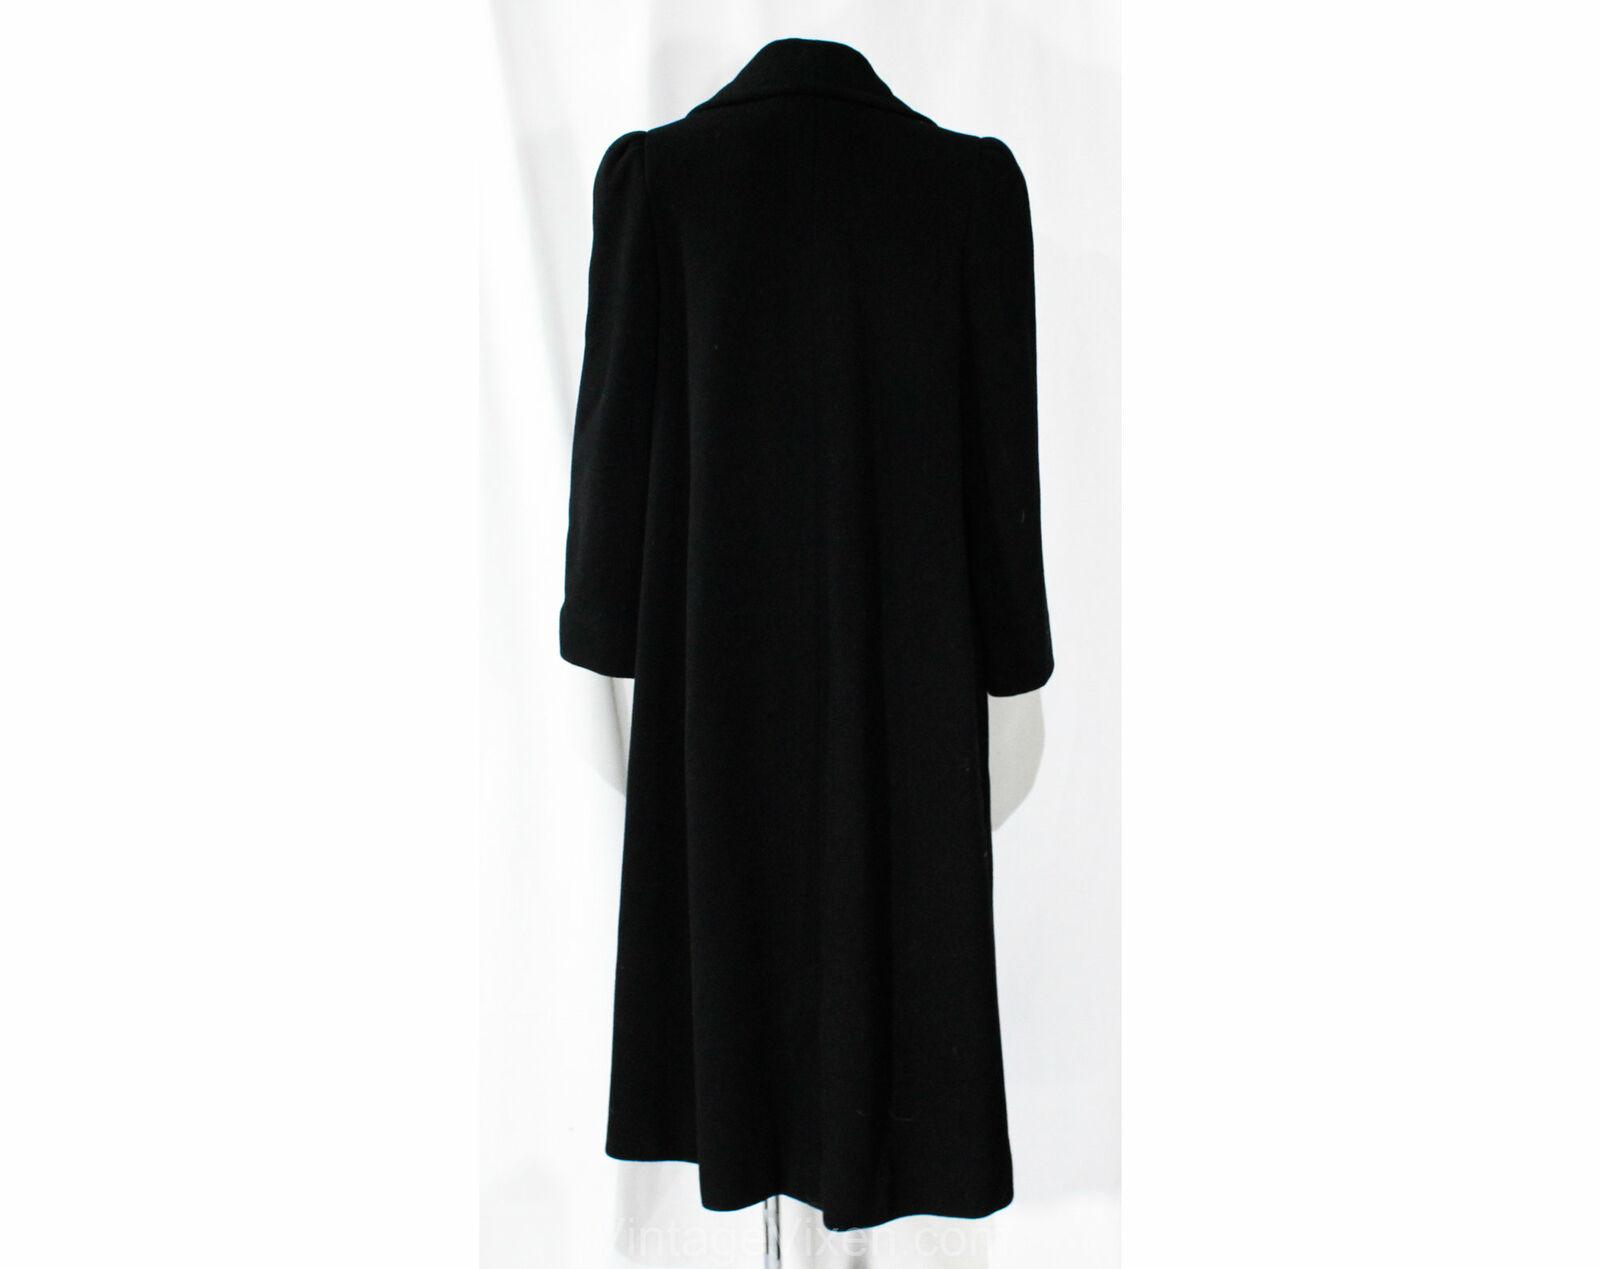 Size 10 Black Winter Coat - Designer 80s Overcoat… - image 7